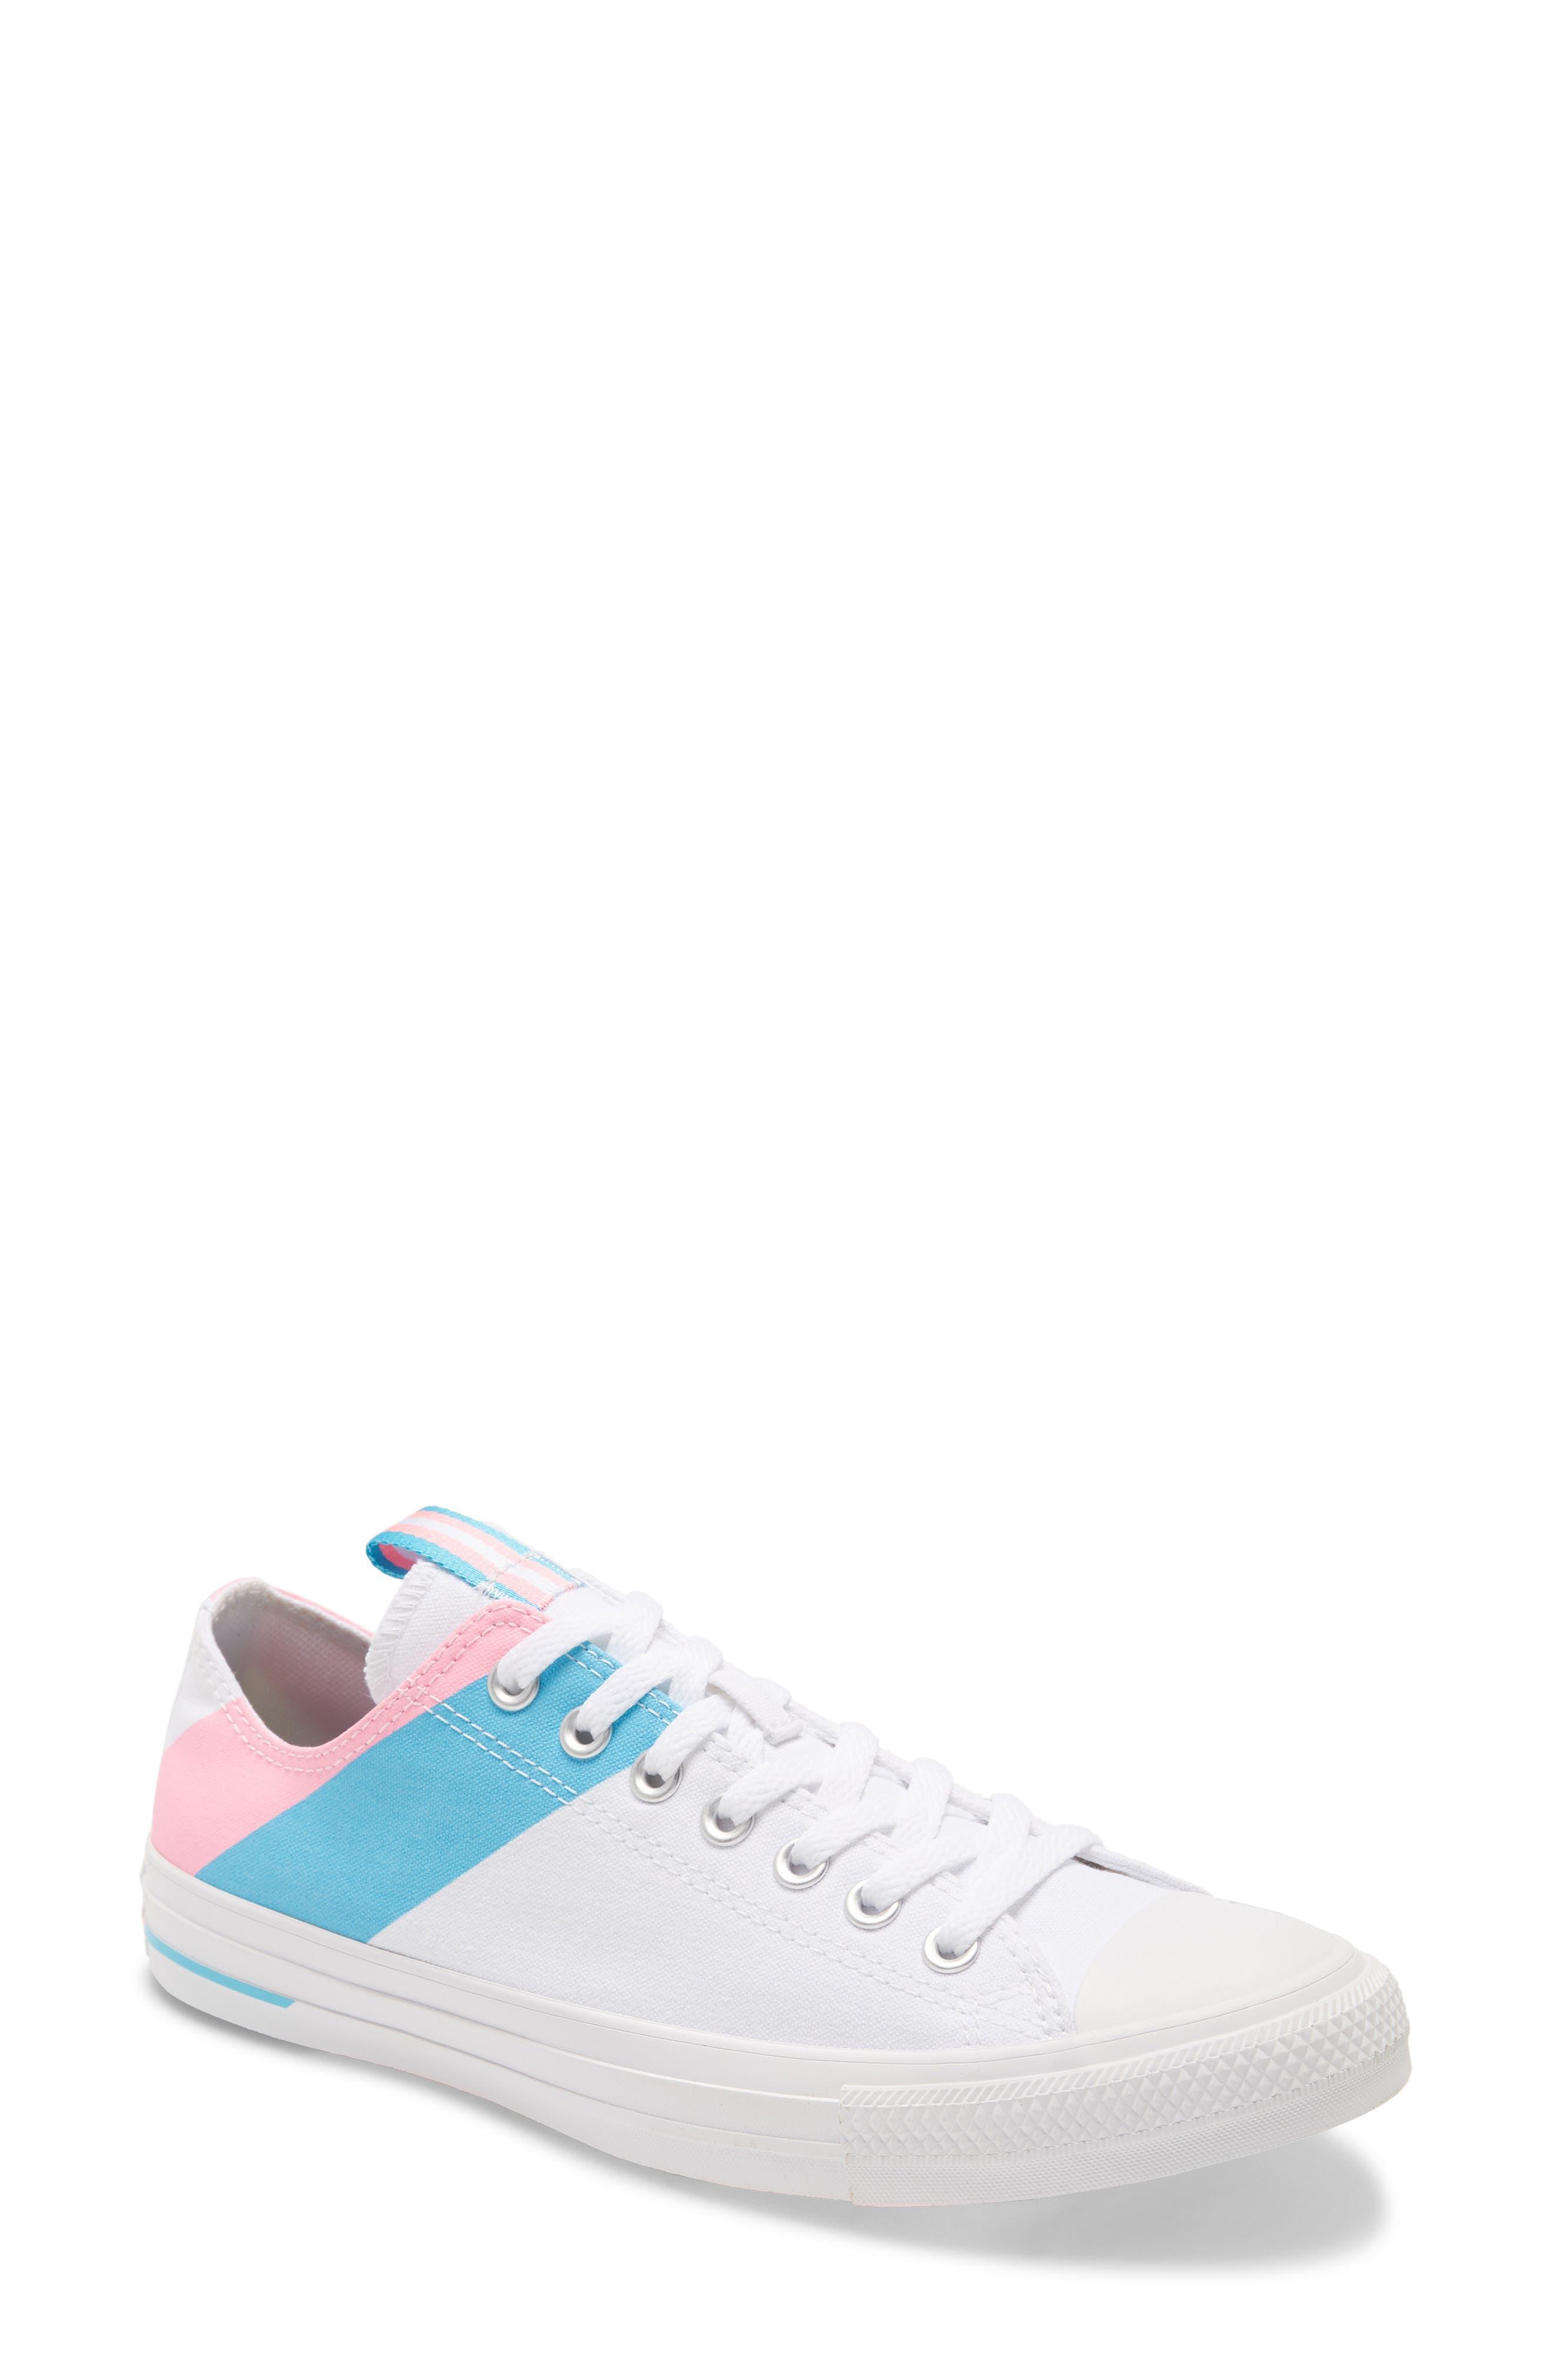 Star Low Top Pride Sneaker, Size 6.5 M